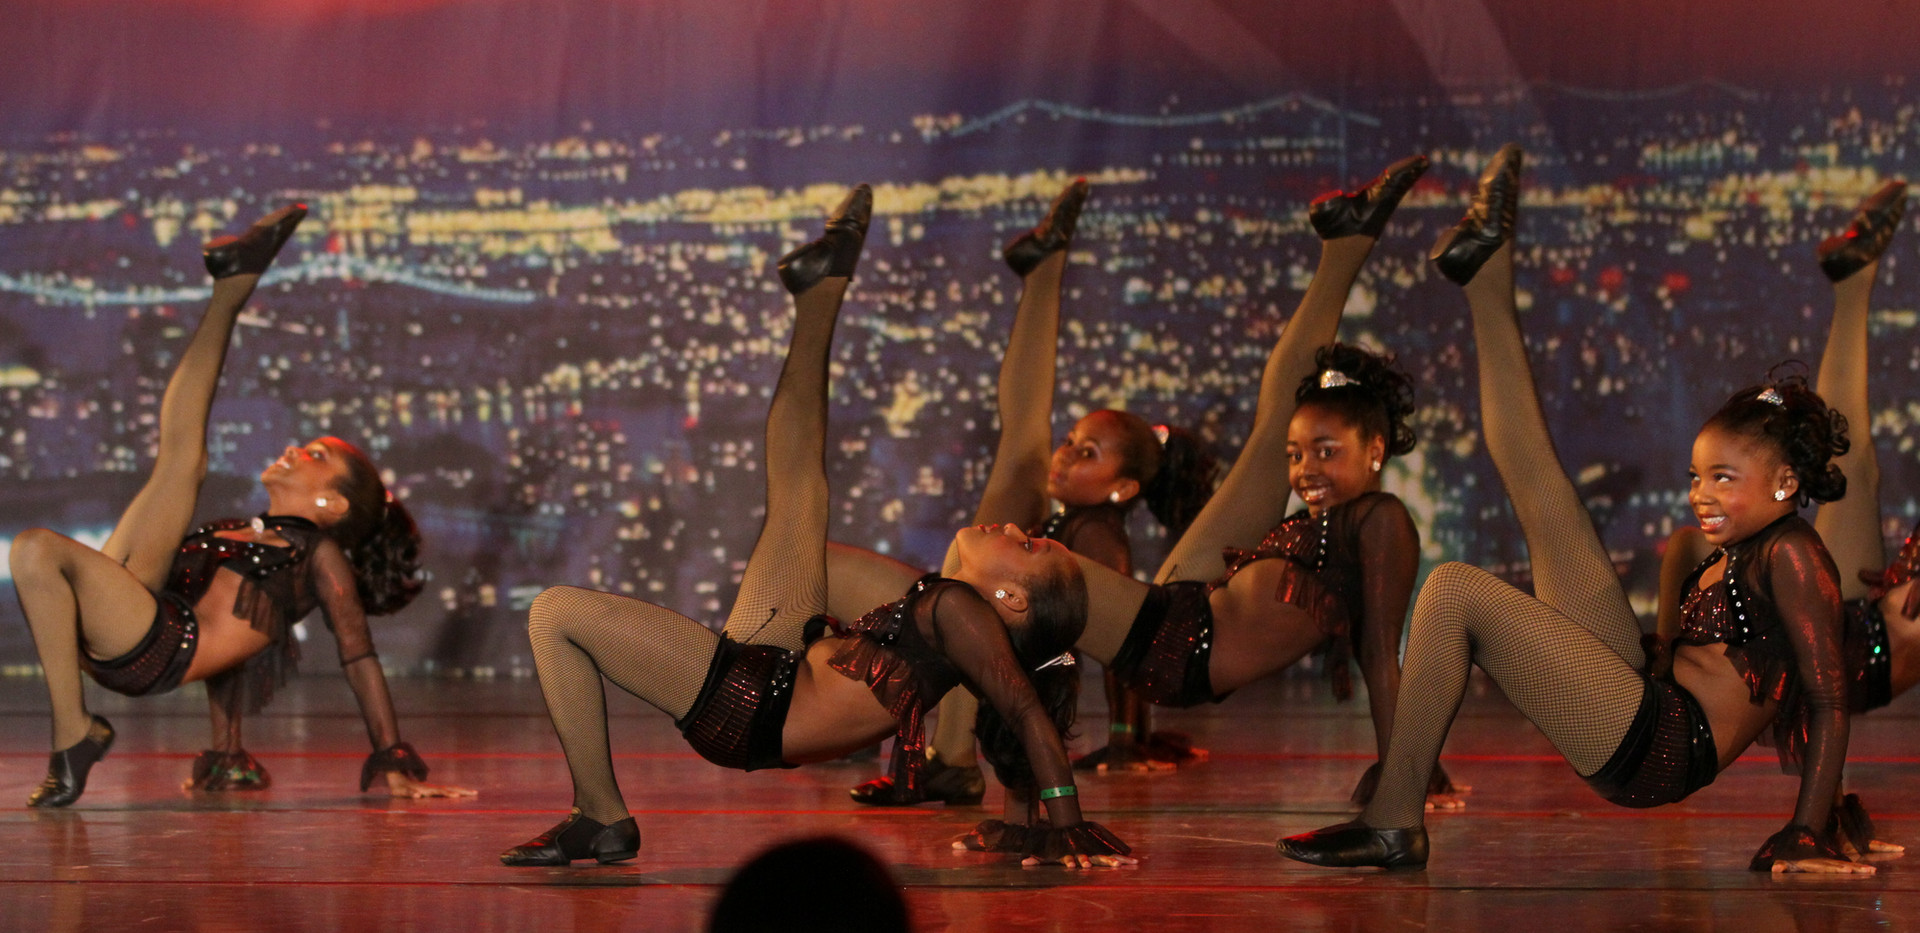 Be Bop (2011) Choreography by Lynise Heard